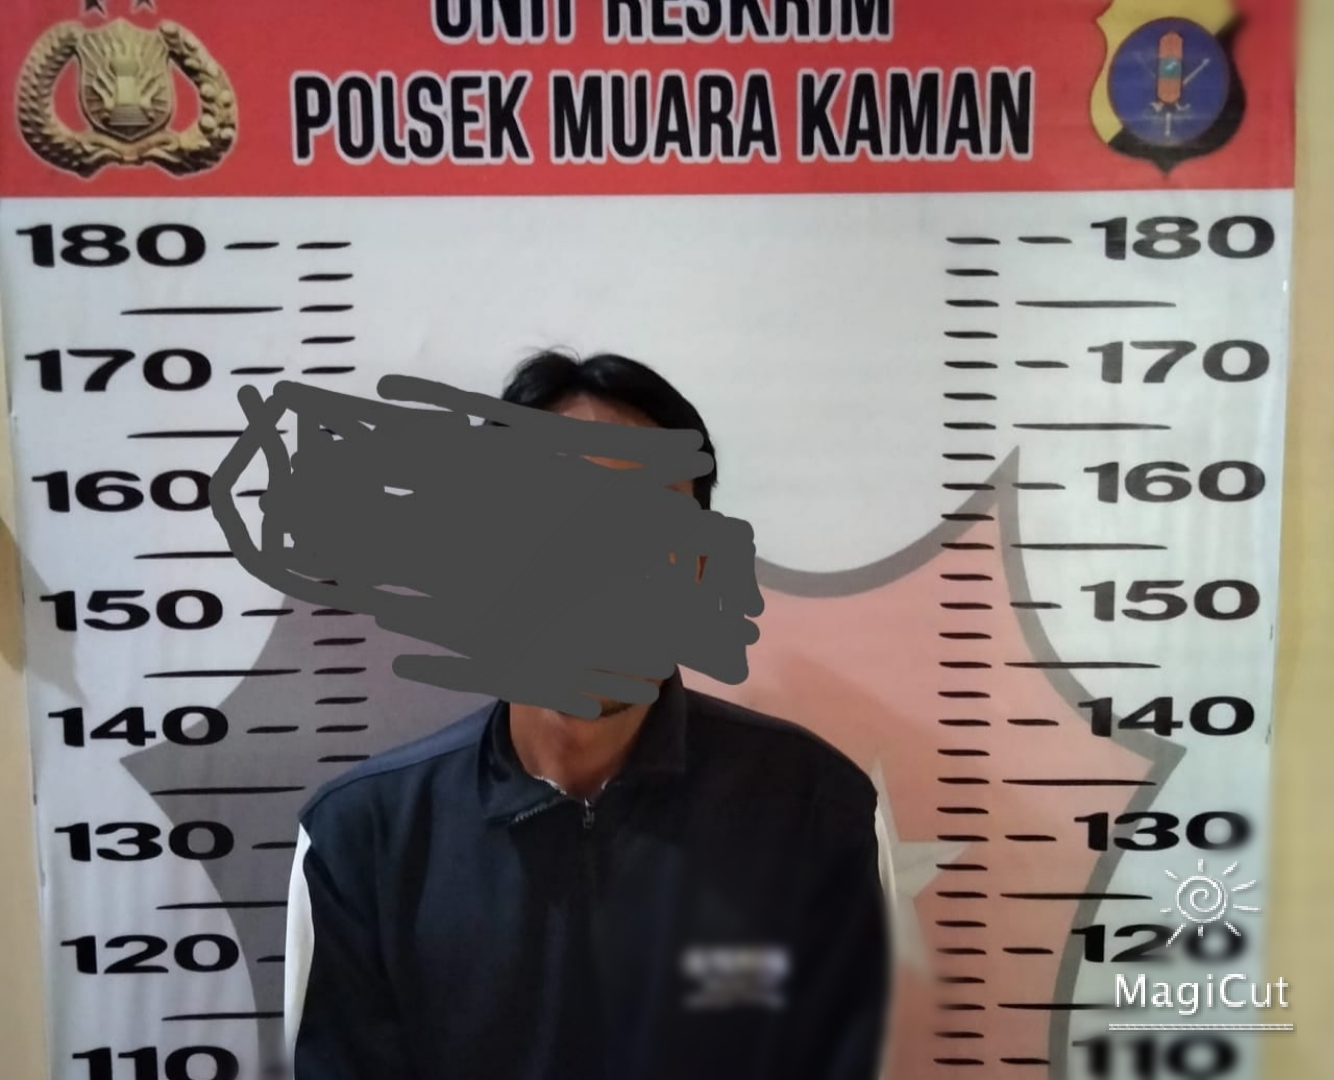 Keterangan Foto : Tersangka Rusdi bersama sejumlah barang bukti yang diamankan oleh Team Biawak Polsek Muara Kaman, Rabu 22 September 2021. (Foto-foto : Polsek Muara Kaman).